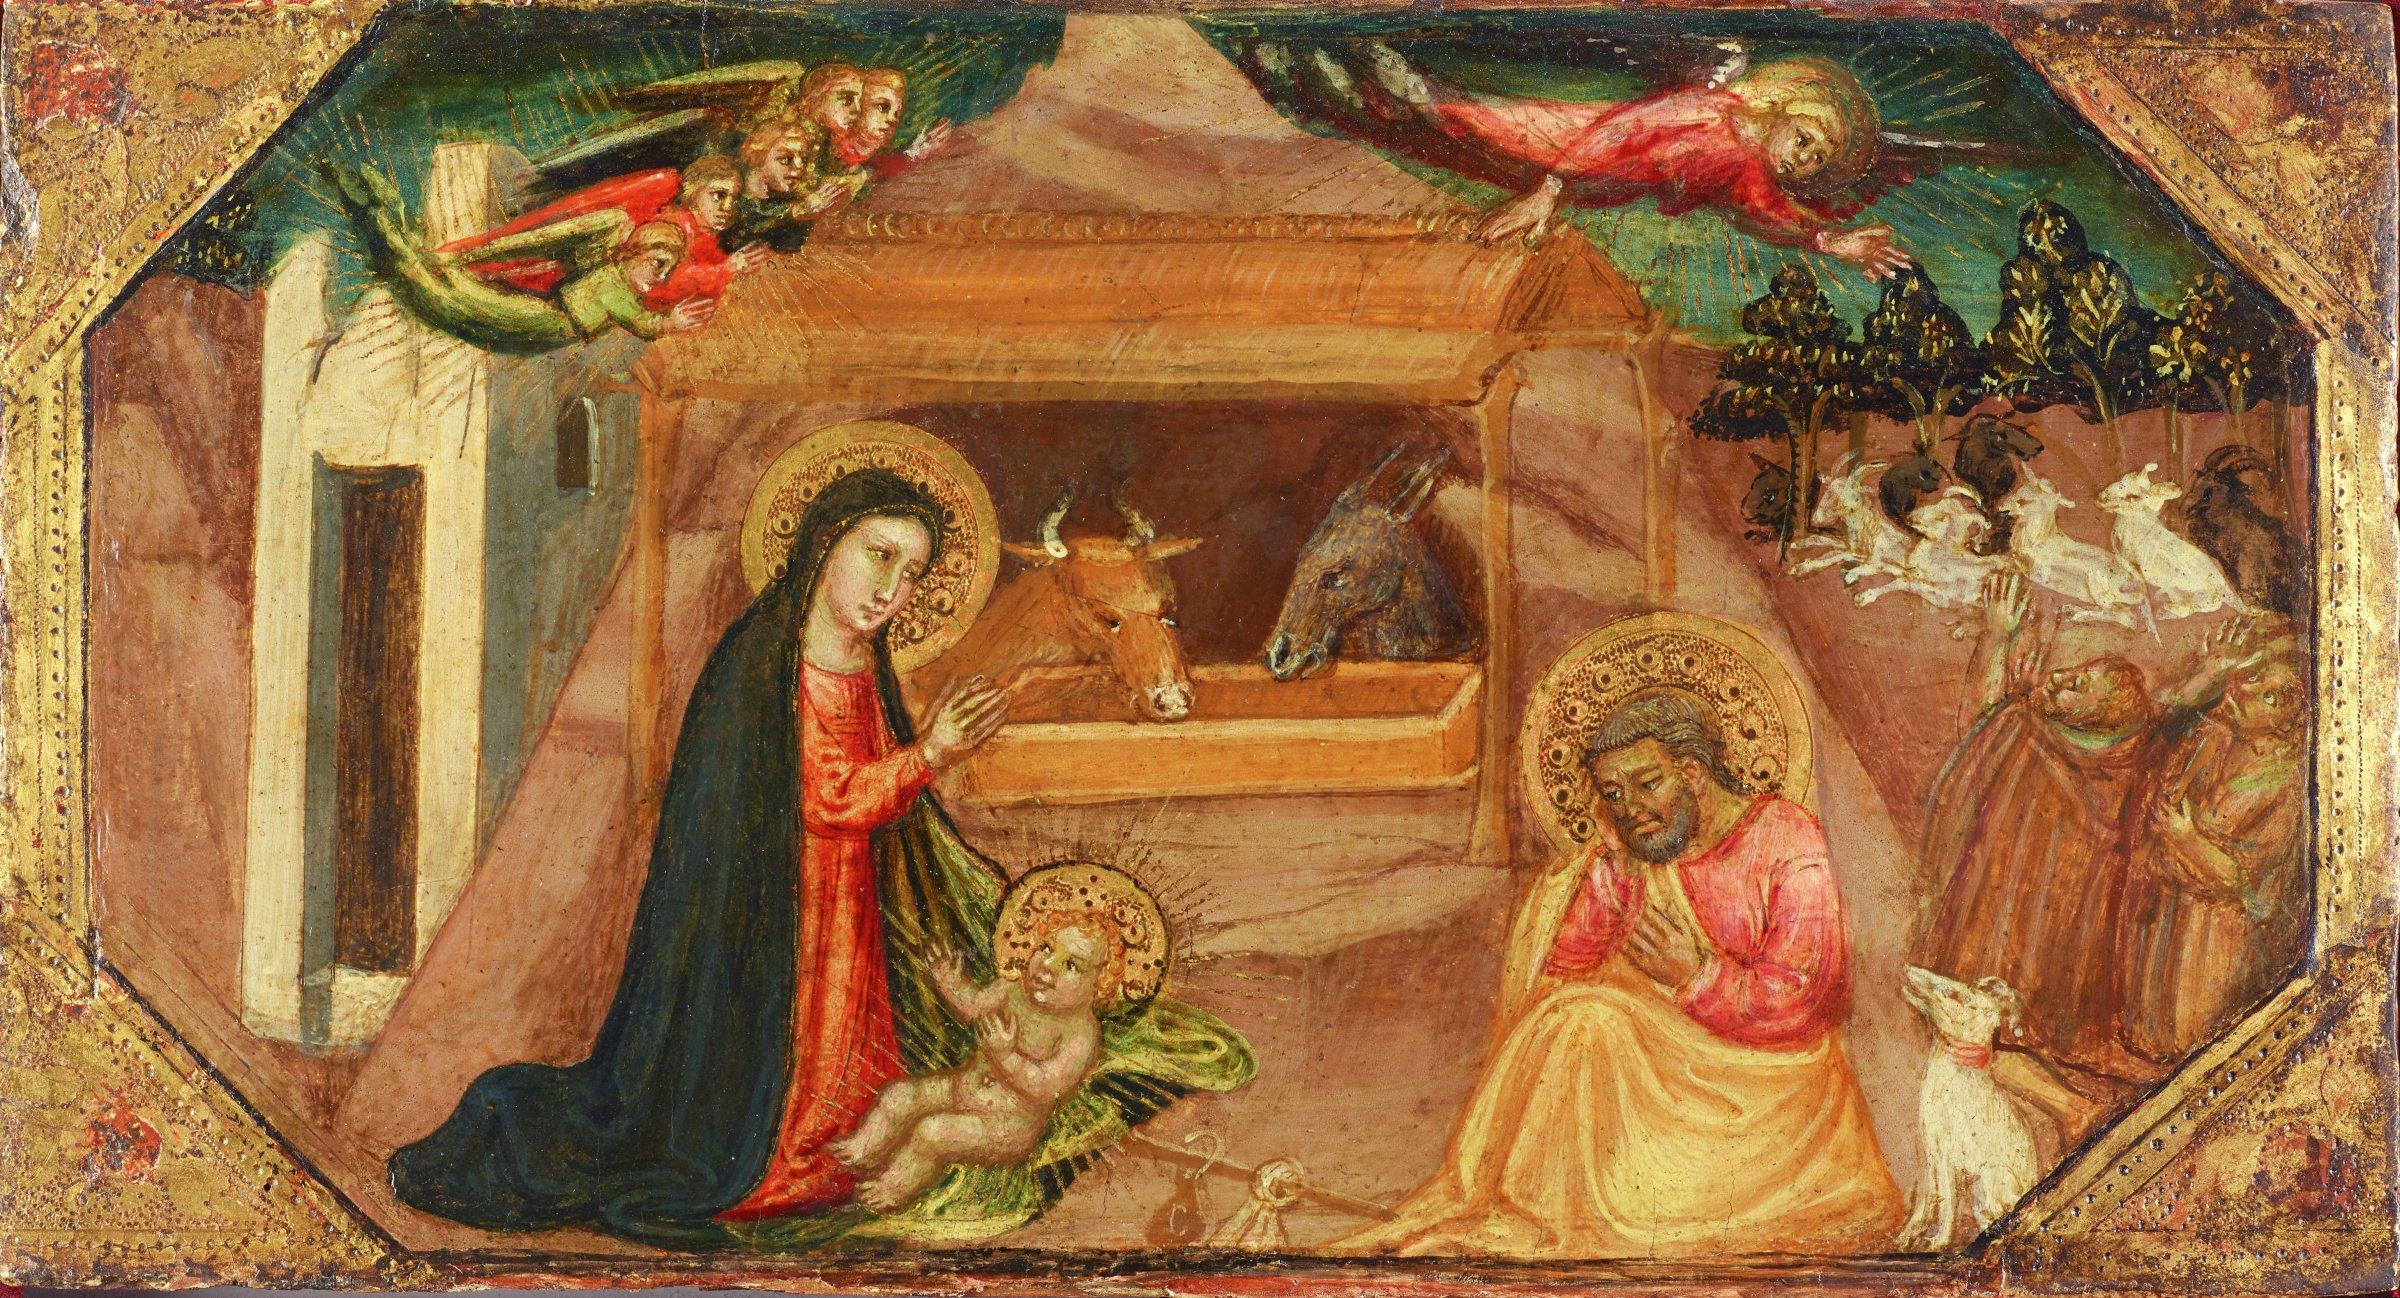 Nativity, Bicci di Lorenzo, tempera on panel